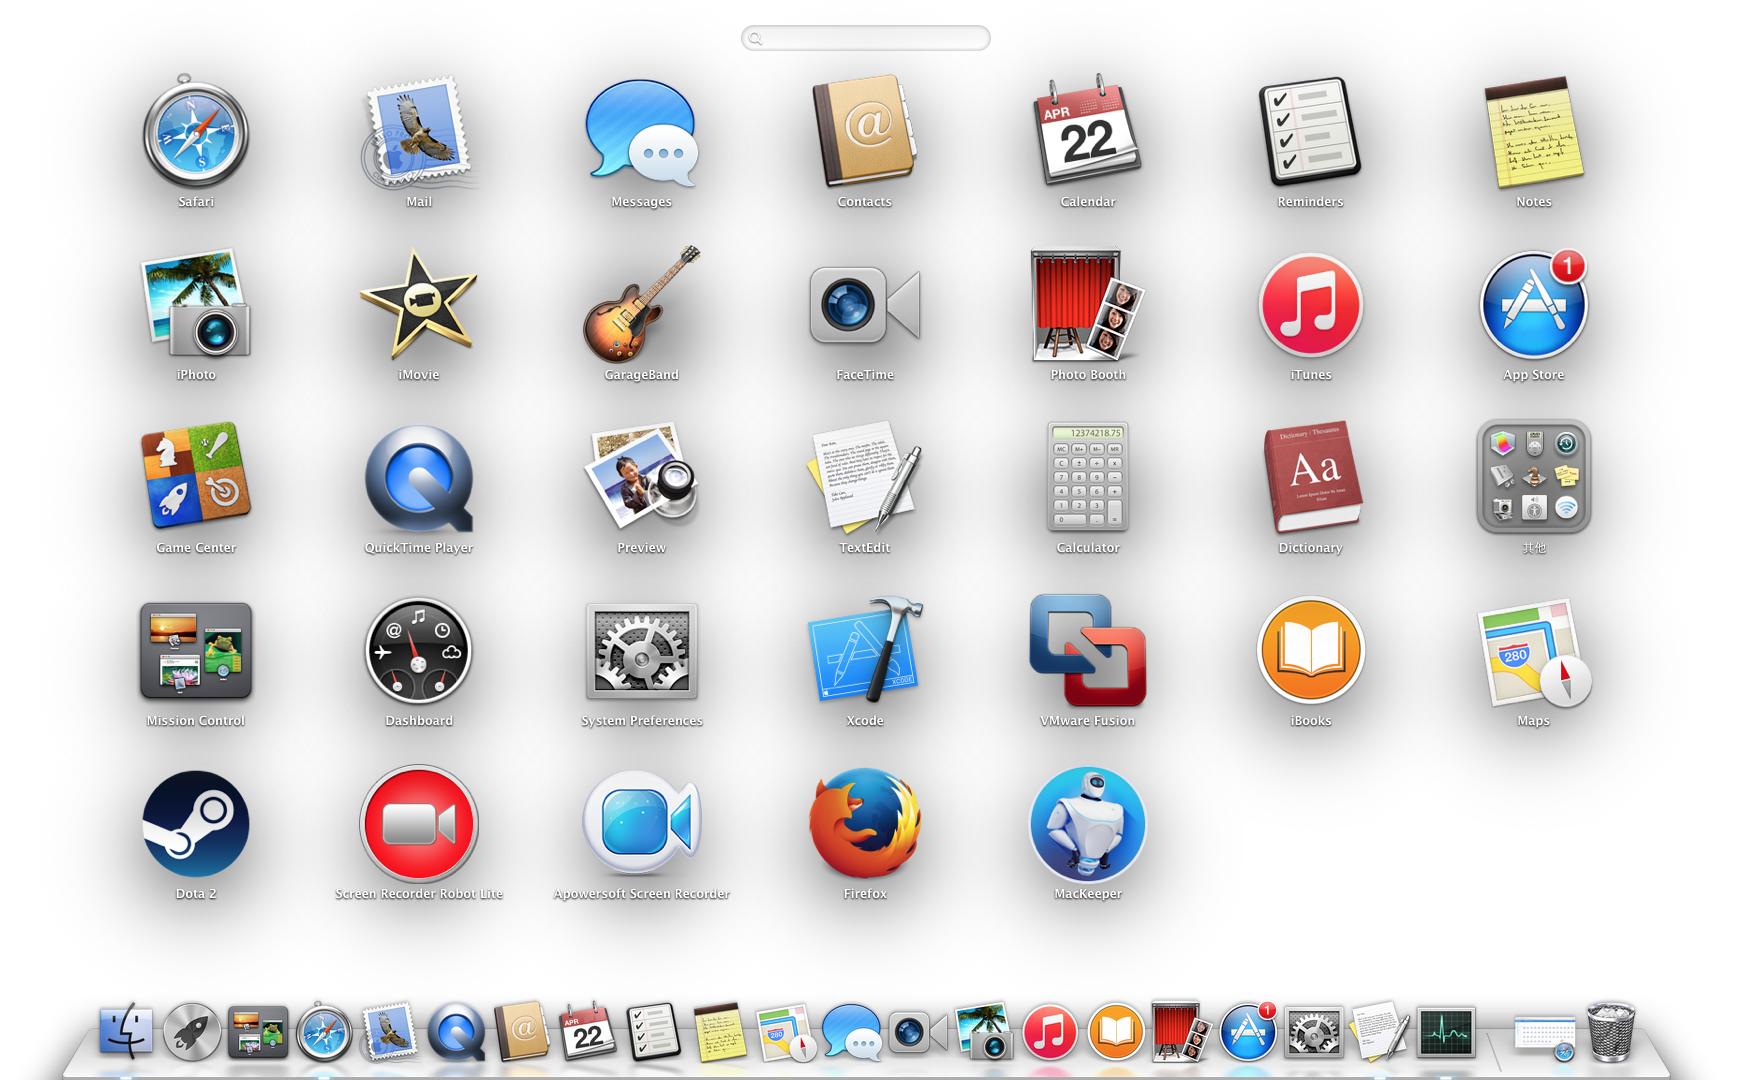 uninstall uTorrent (µTorrent) on mac